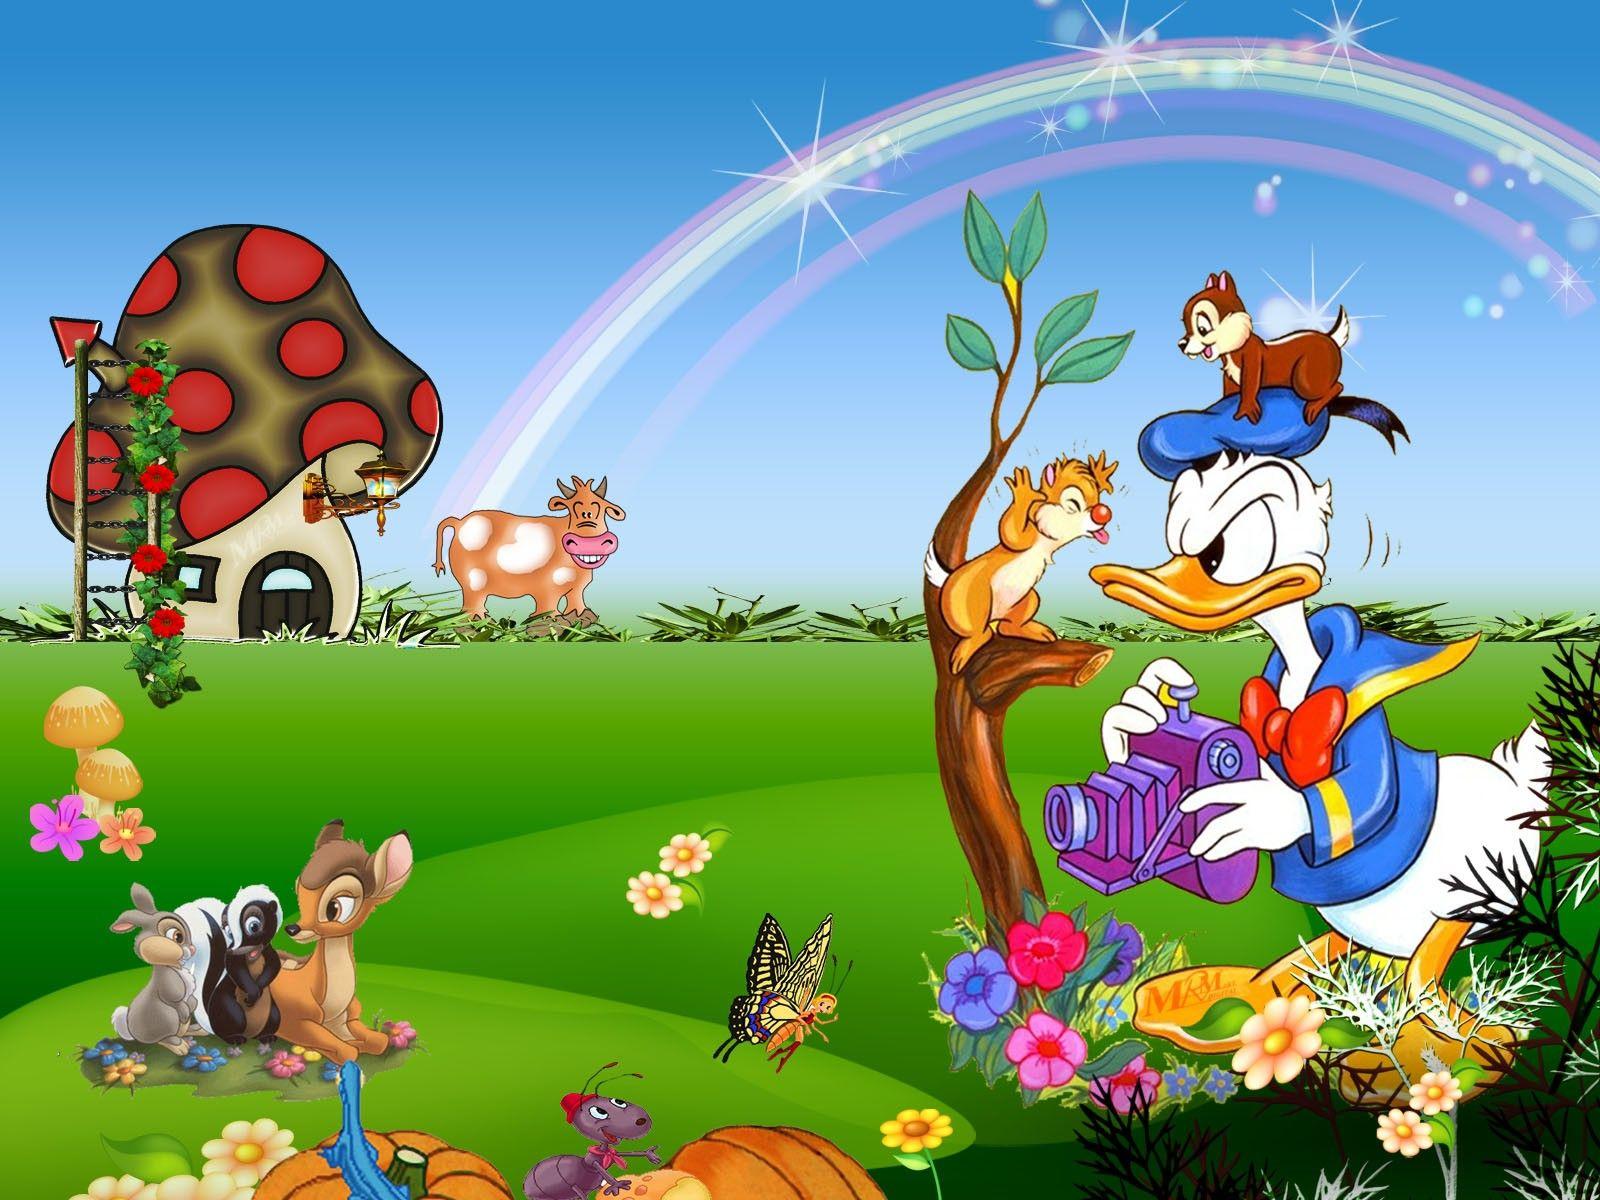 children cartoons hd cartoon wallpapers for children - Cartoon Pictures For Kids